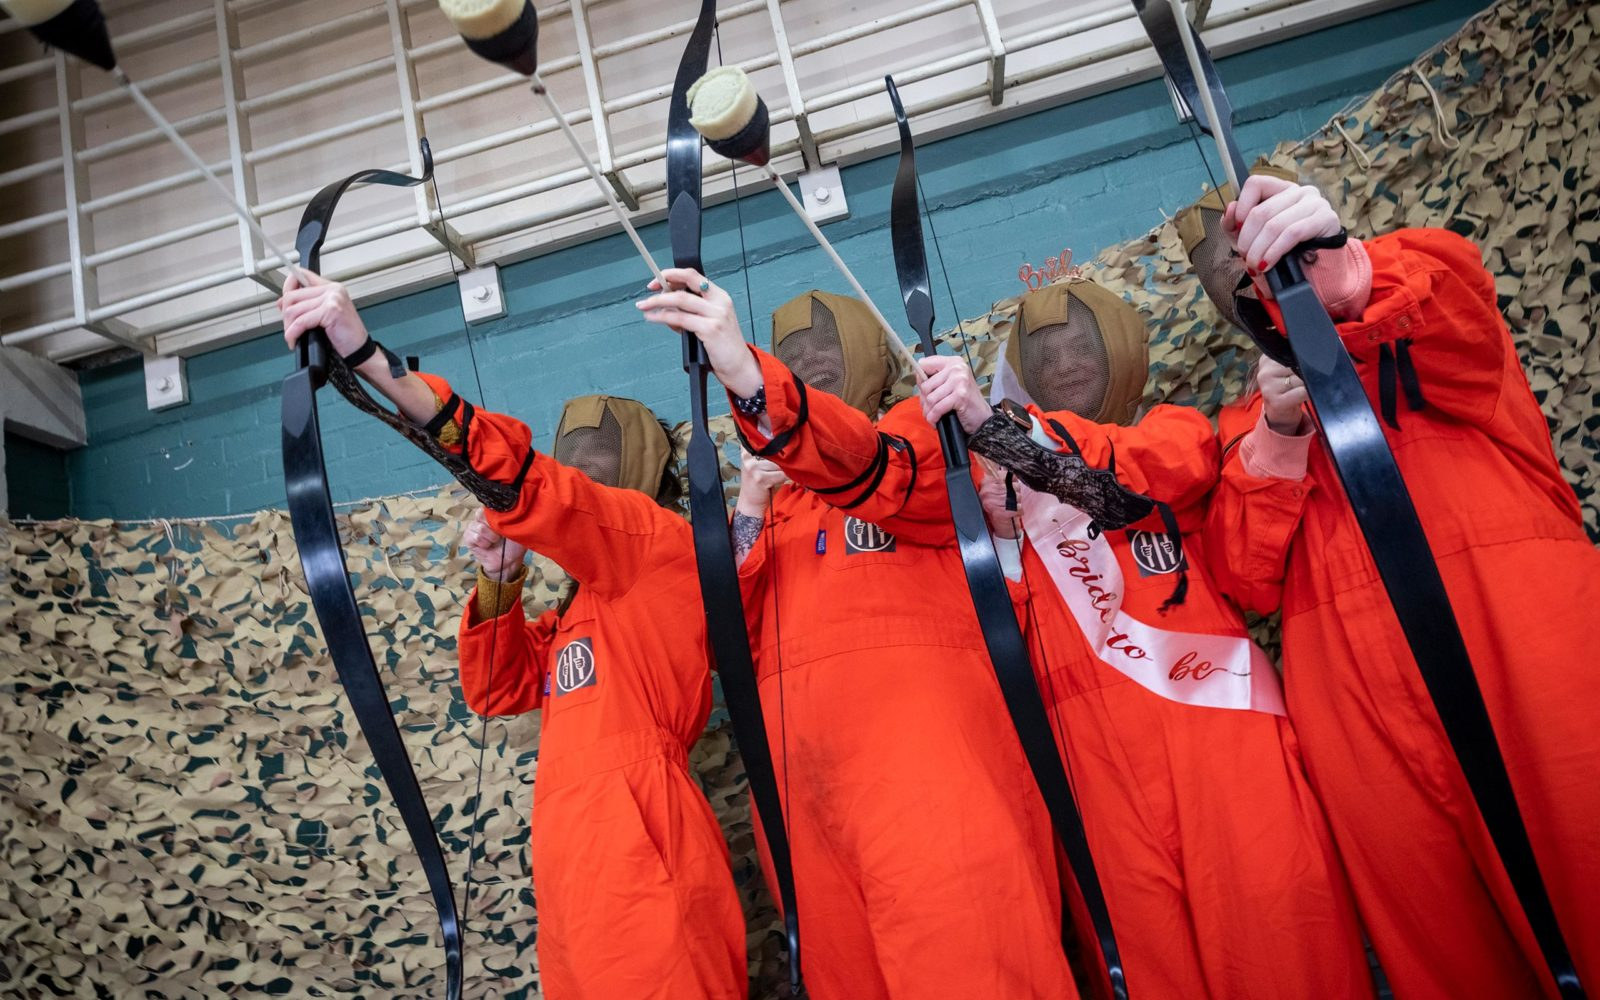 Shrewsbury Prison Archery